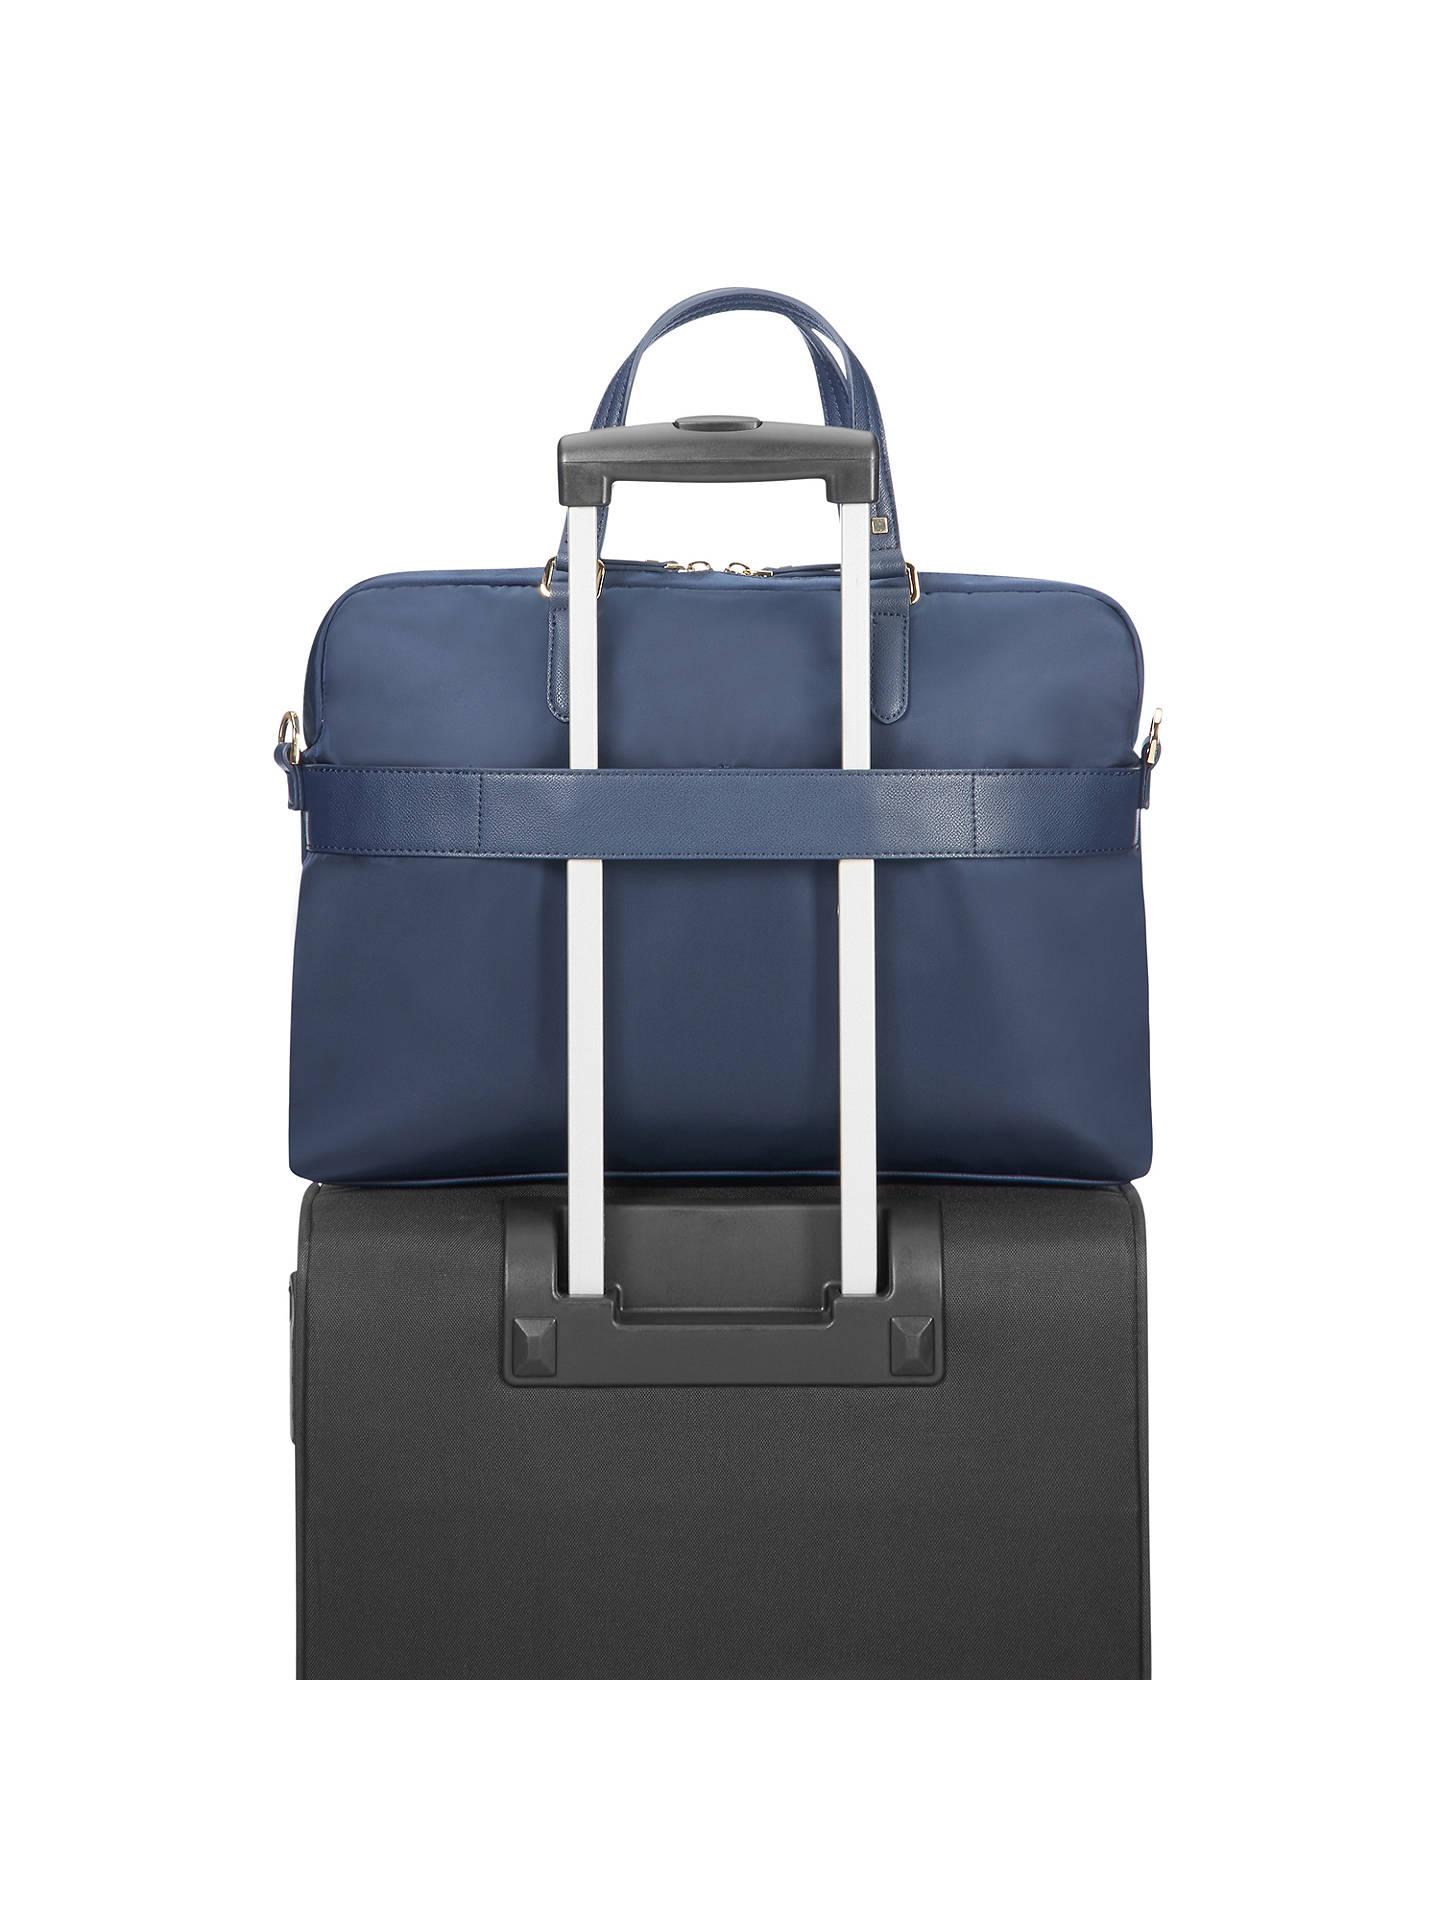 Samsonite Karissa Biz Bali Handle 15 6 Laptop Bag Navy At John